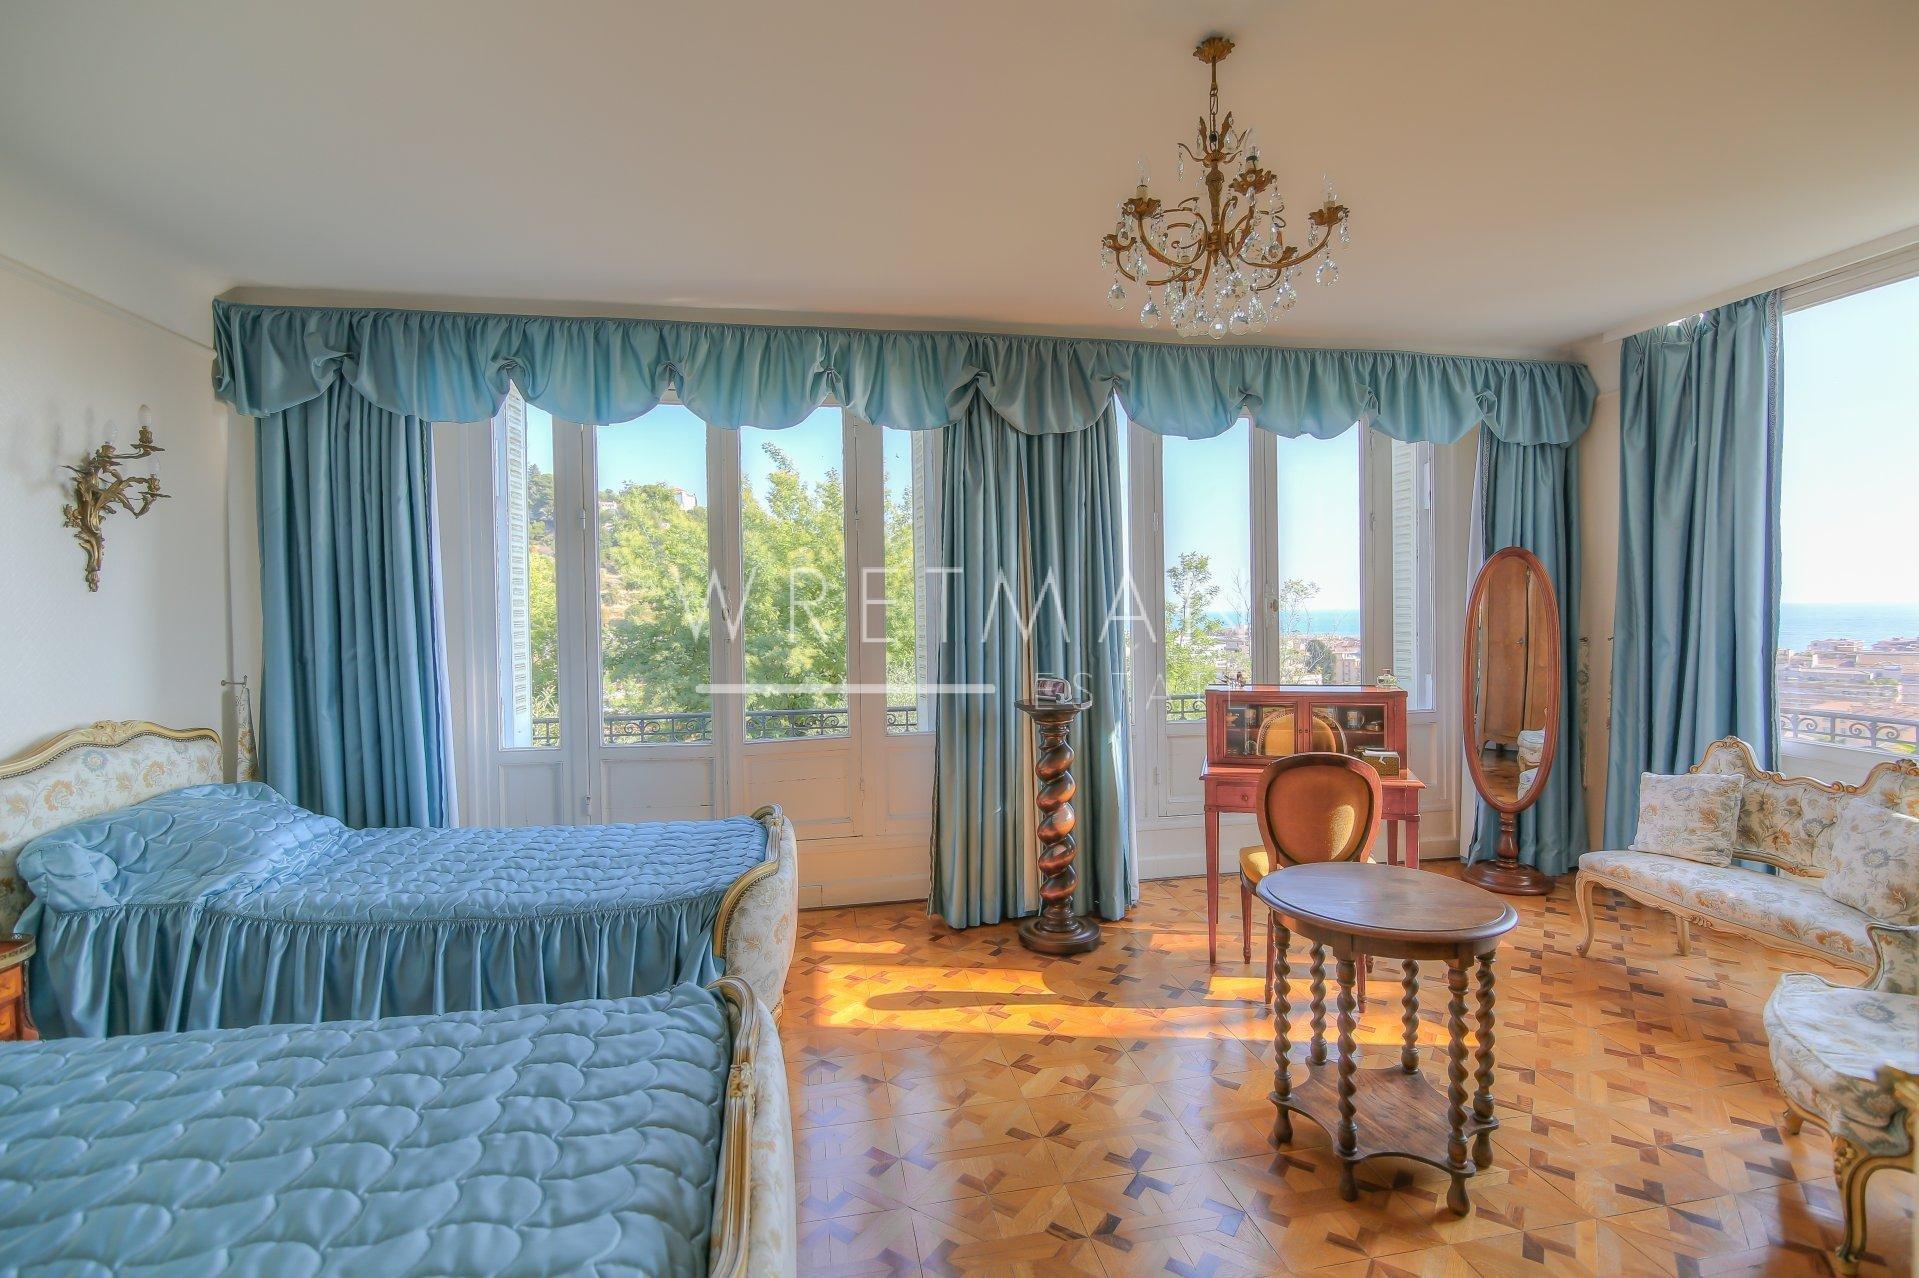 Exceptional 4 bedroom duplex flat - Menton Riviera